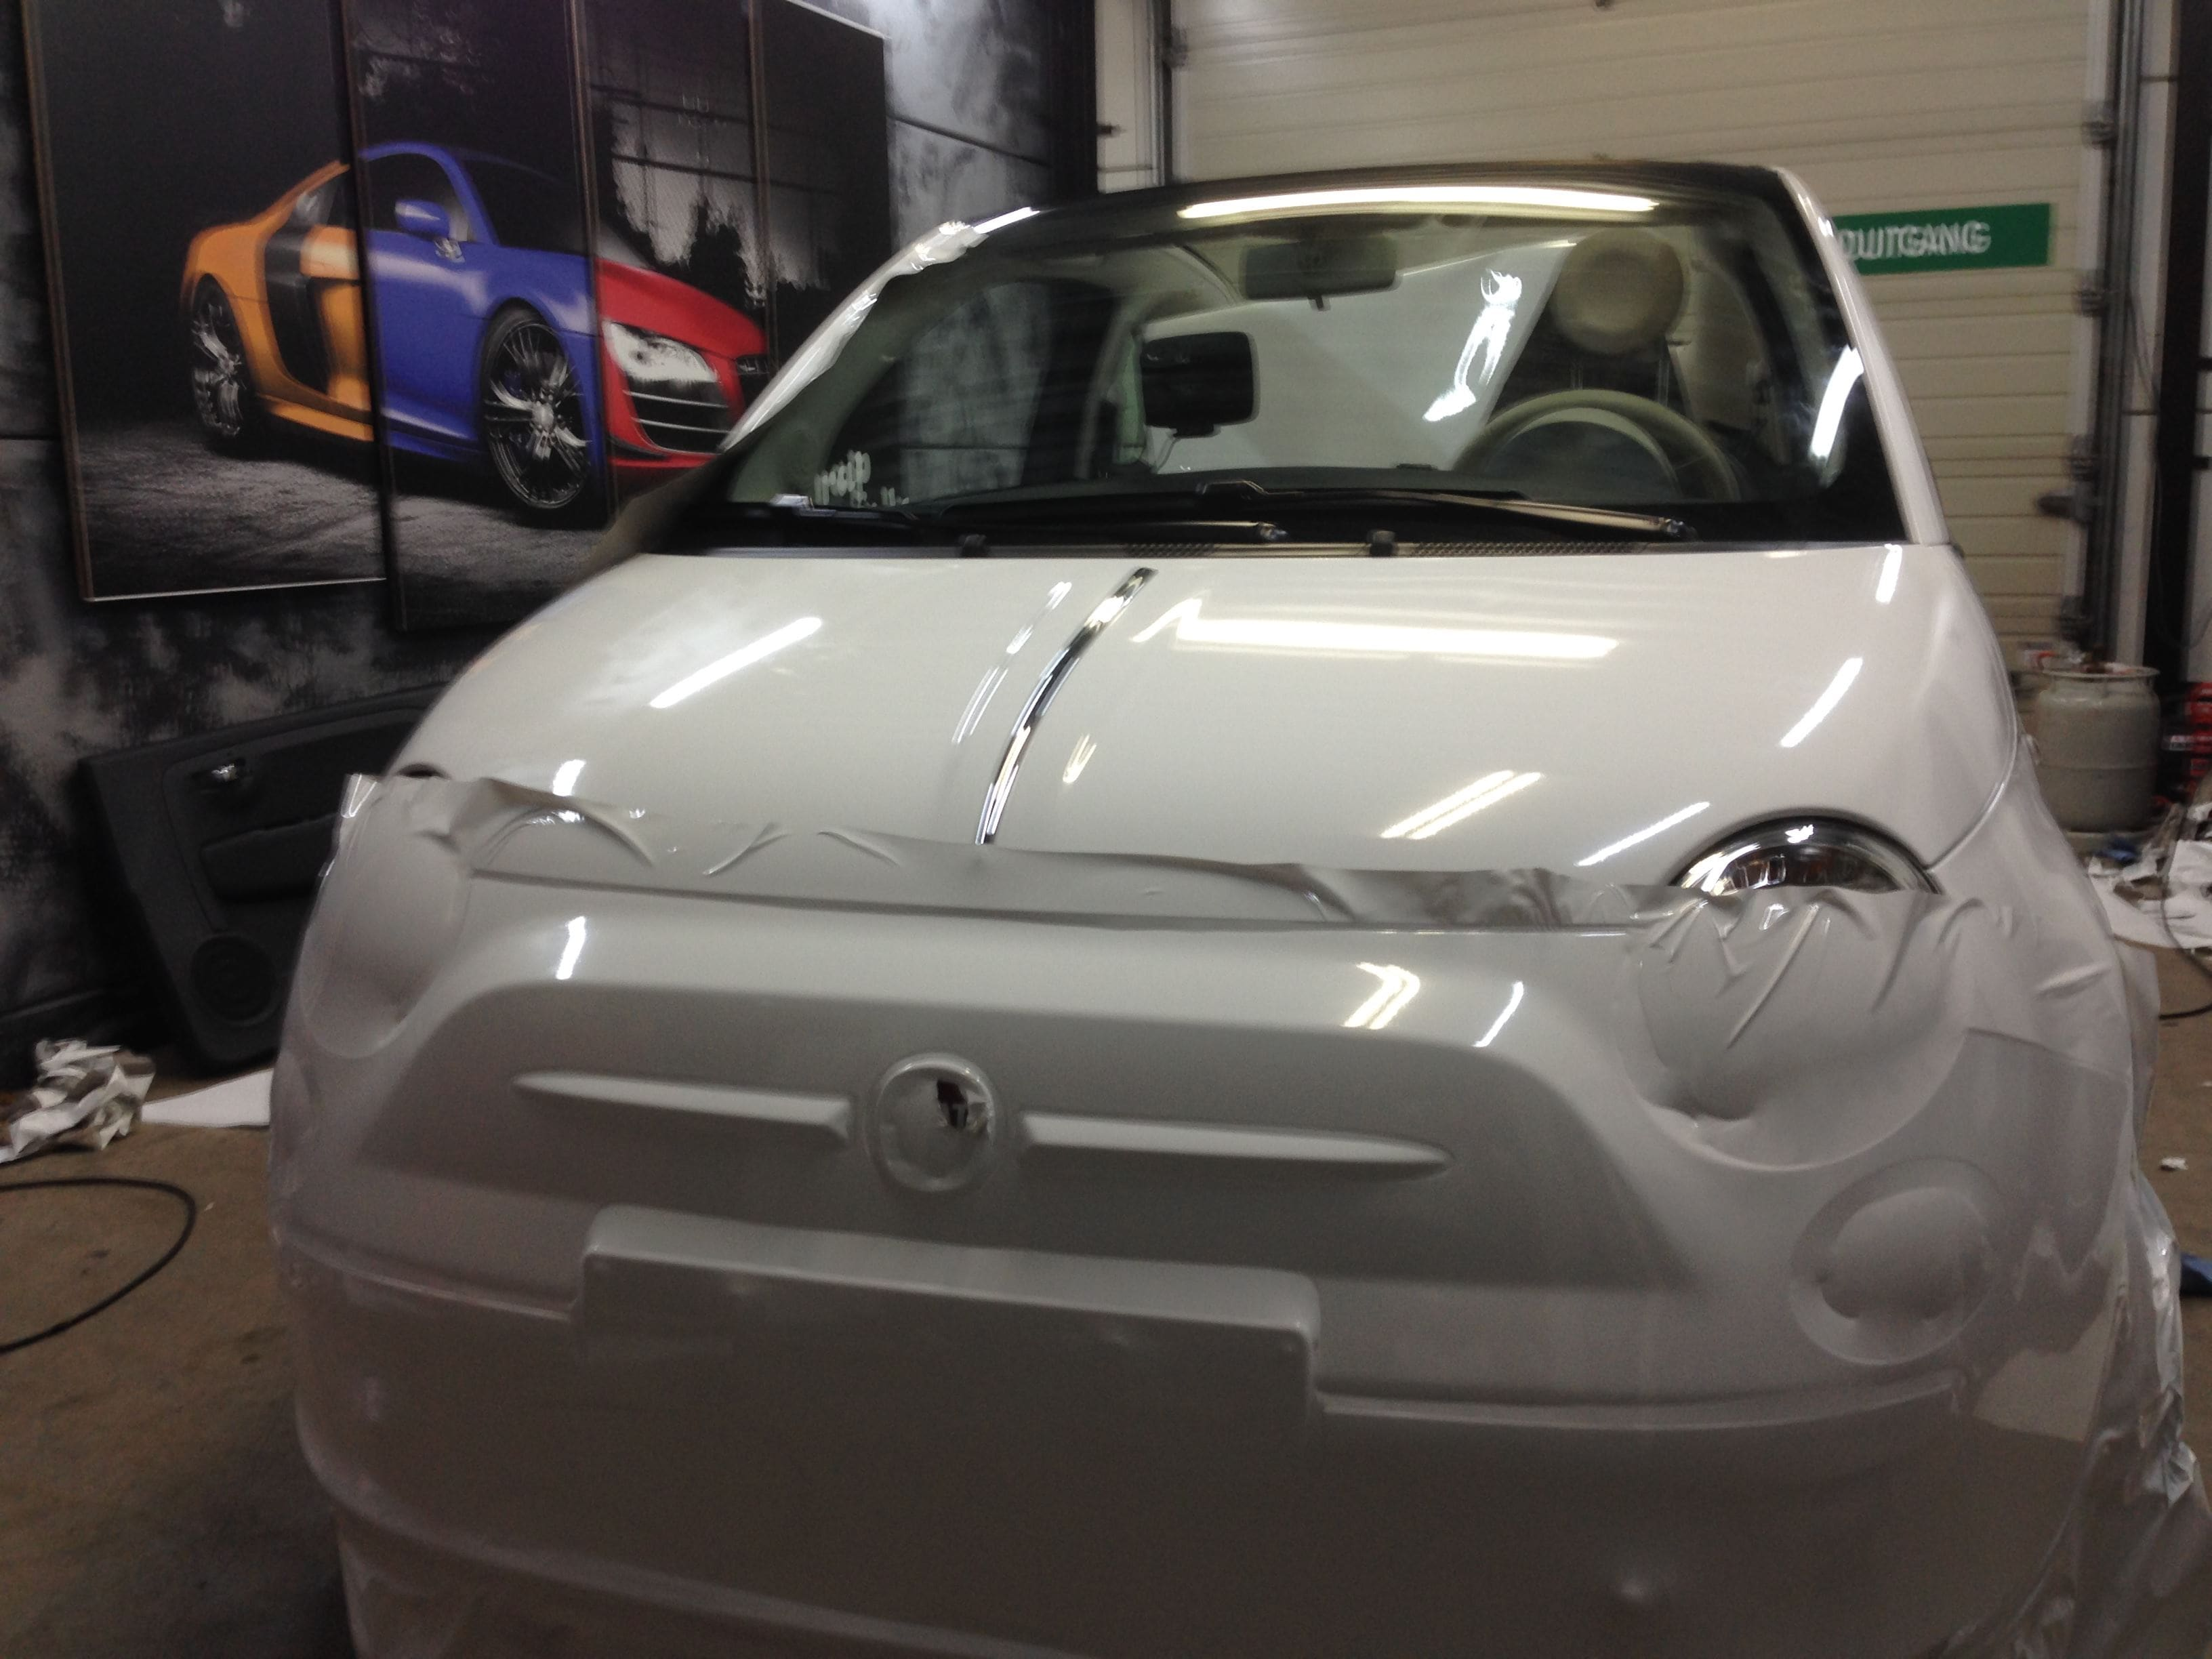 Fiat 500 met Glossy White Wrap, Carwrapping door Wrapmyride.nu Foto-nr:5723, ©2020